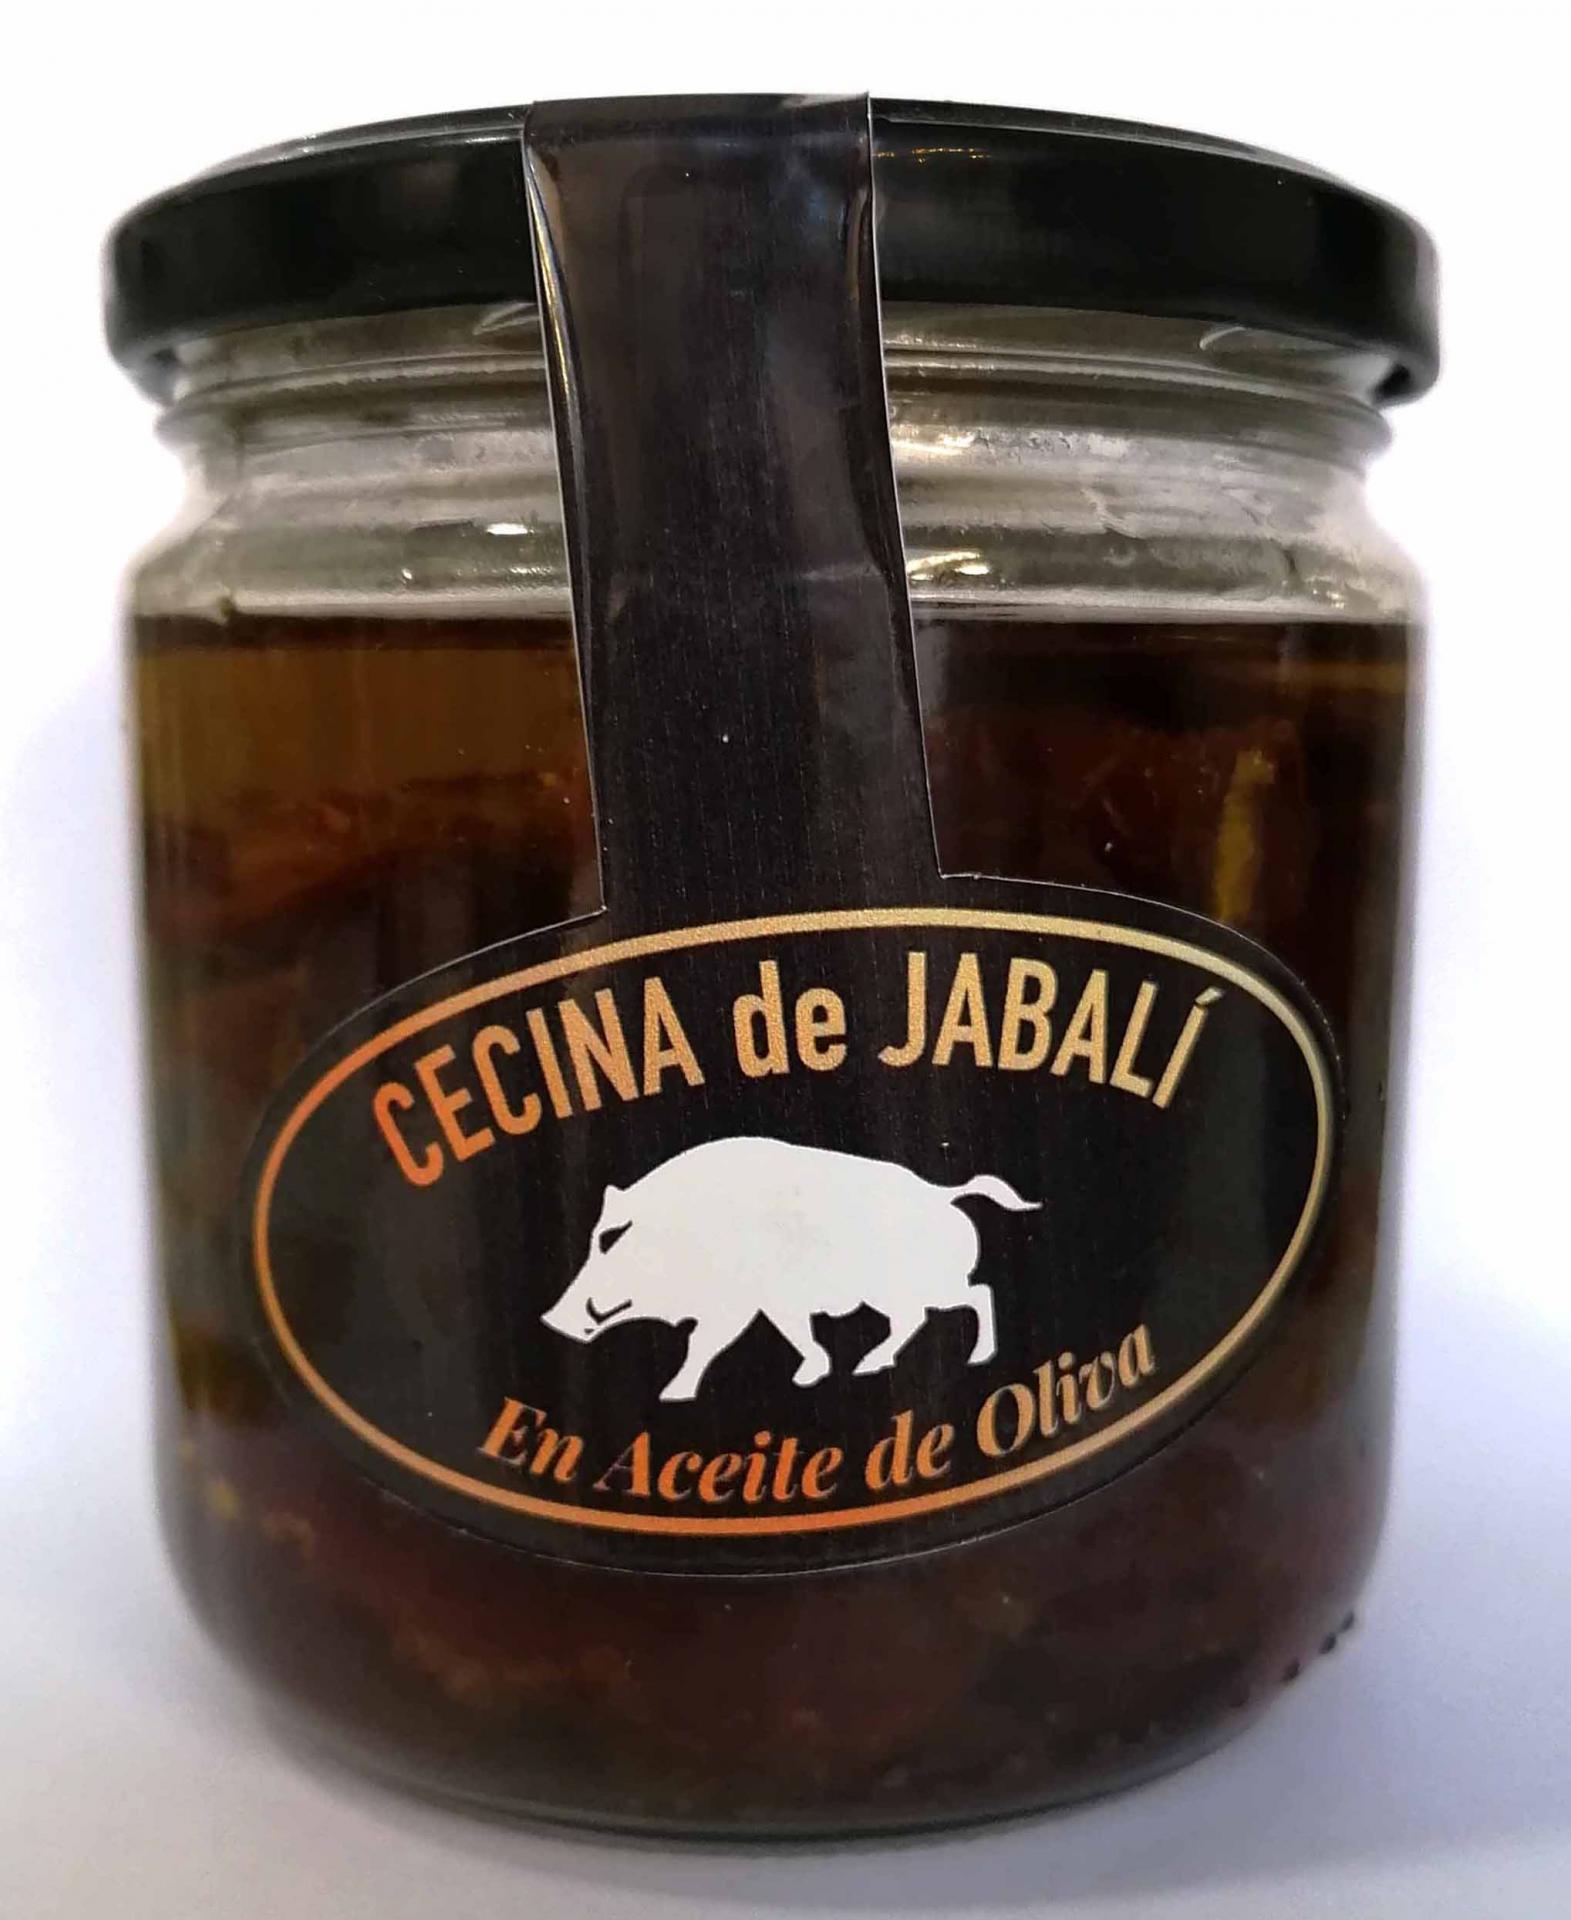 Cecina de jabalí en aceite de oliva